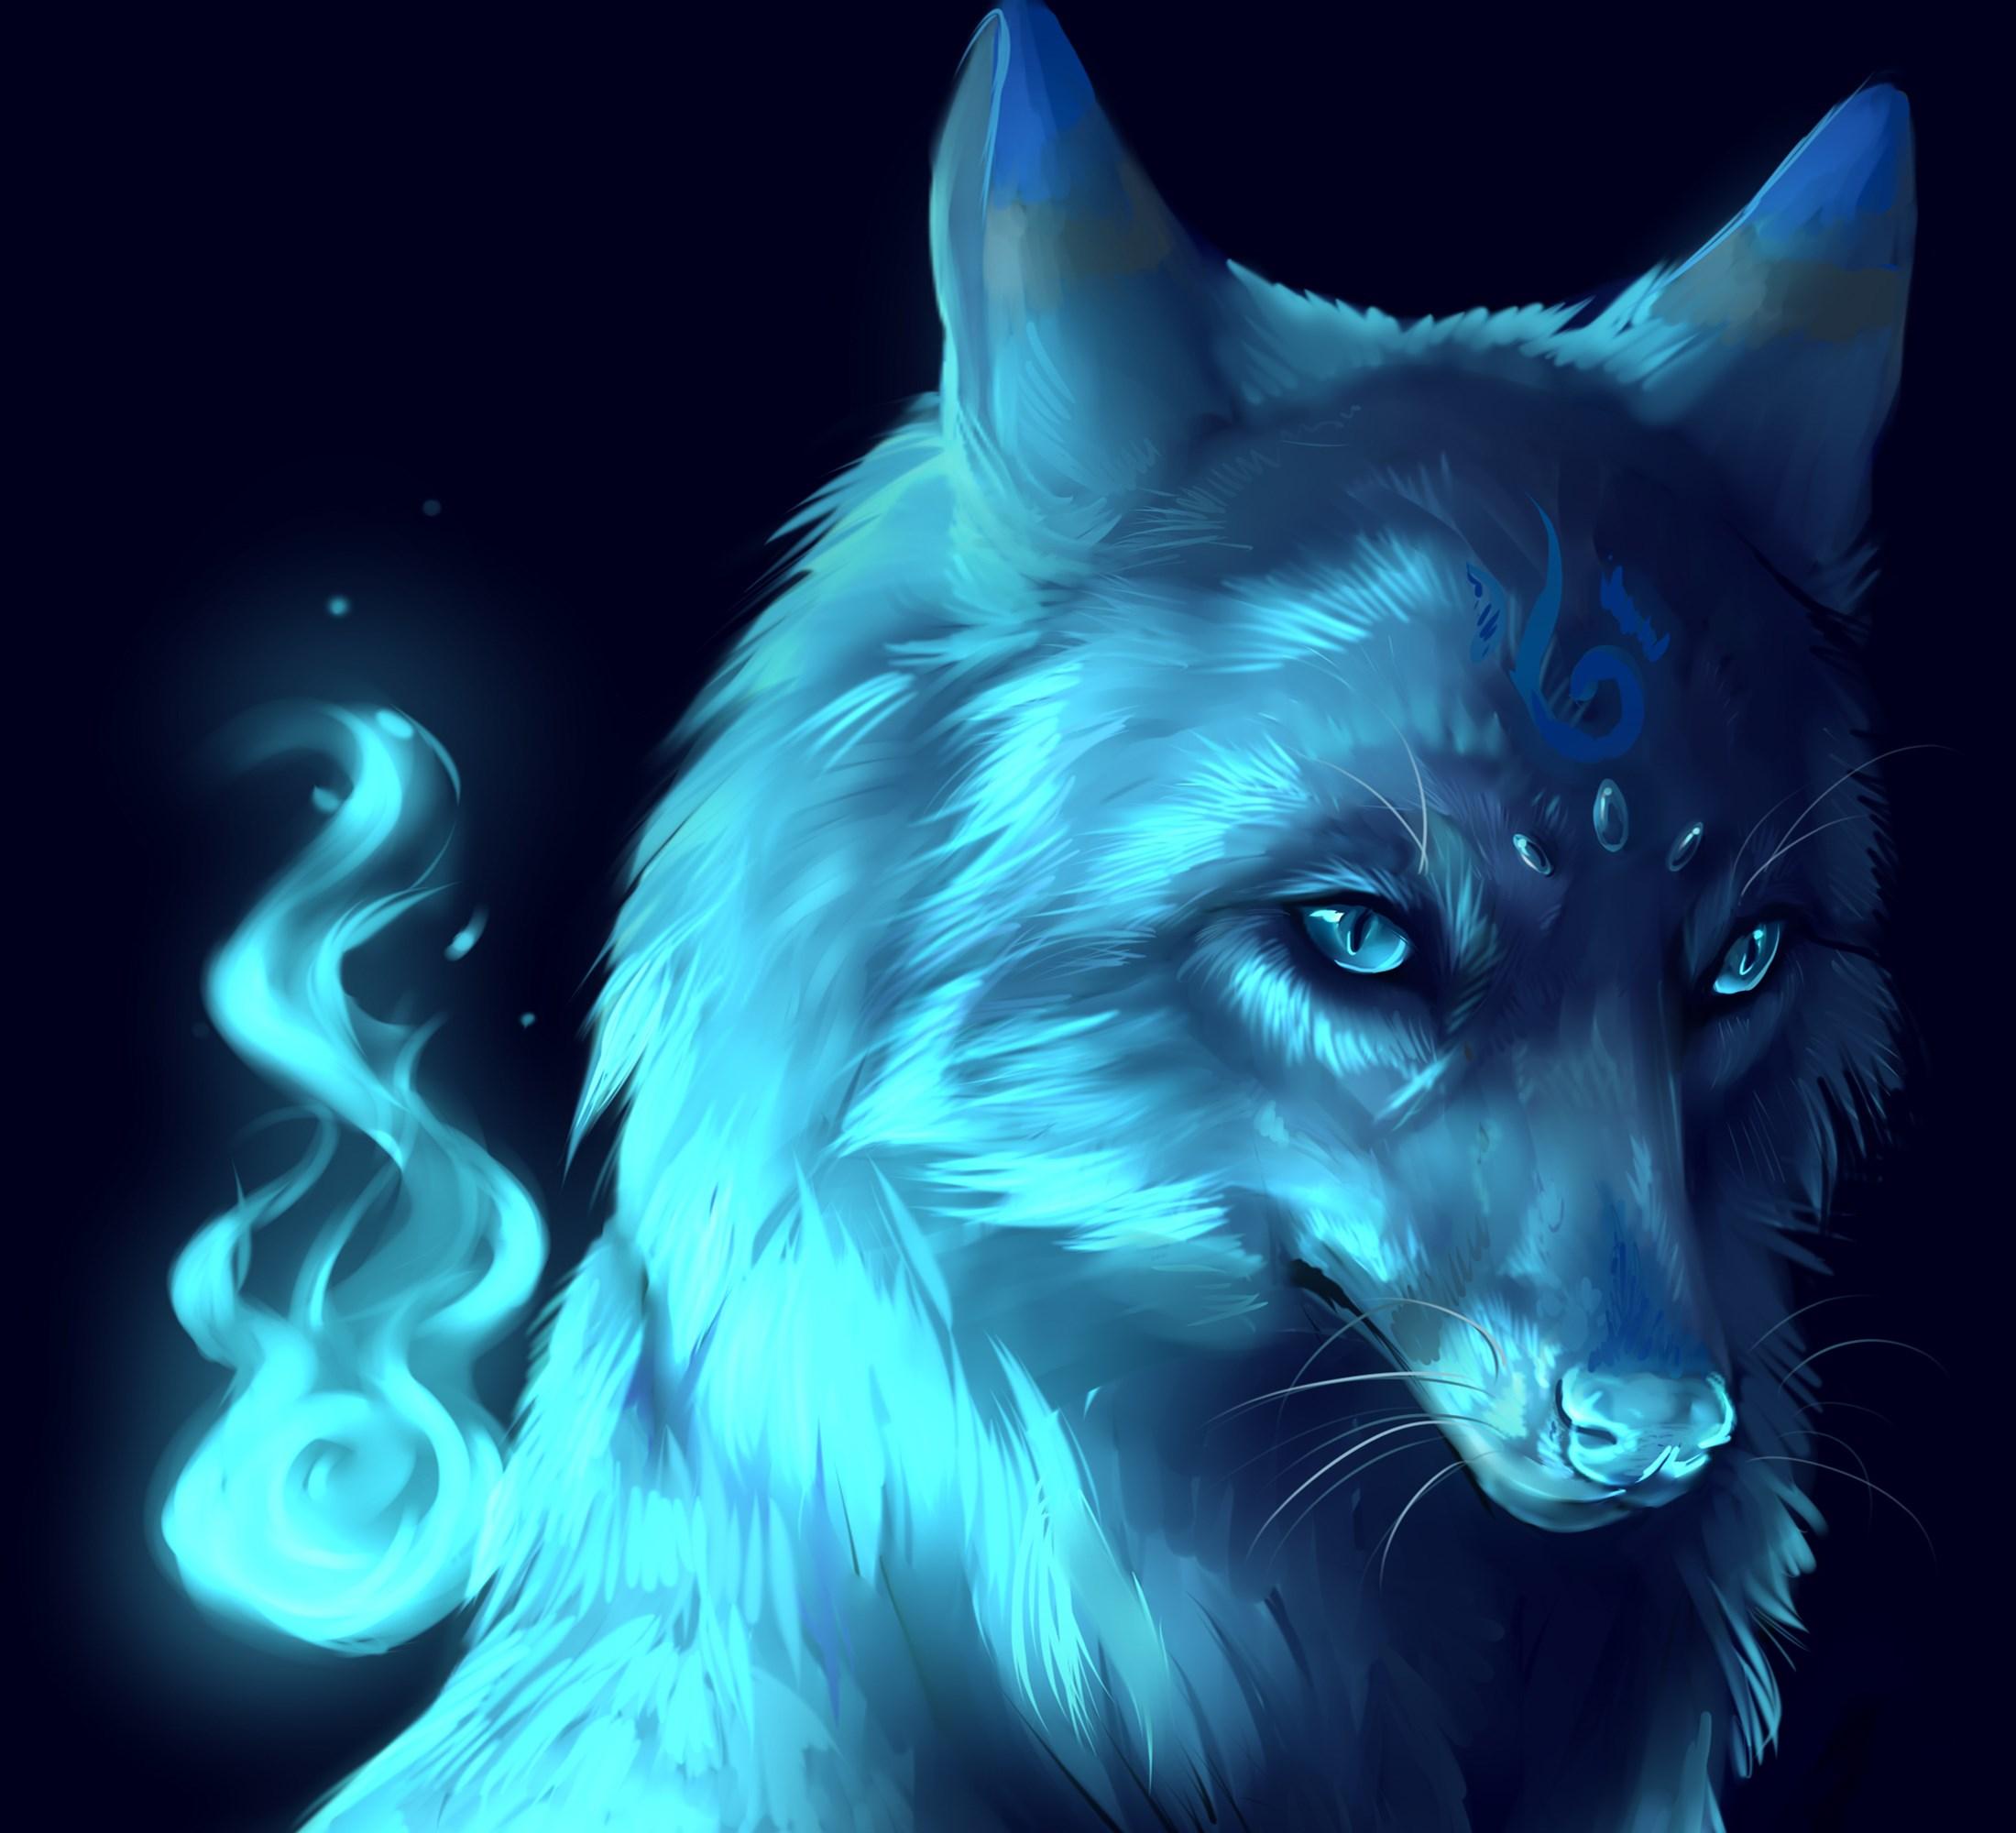 Красивые картинки волчиц на аву